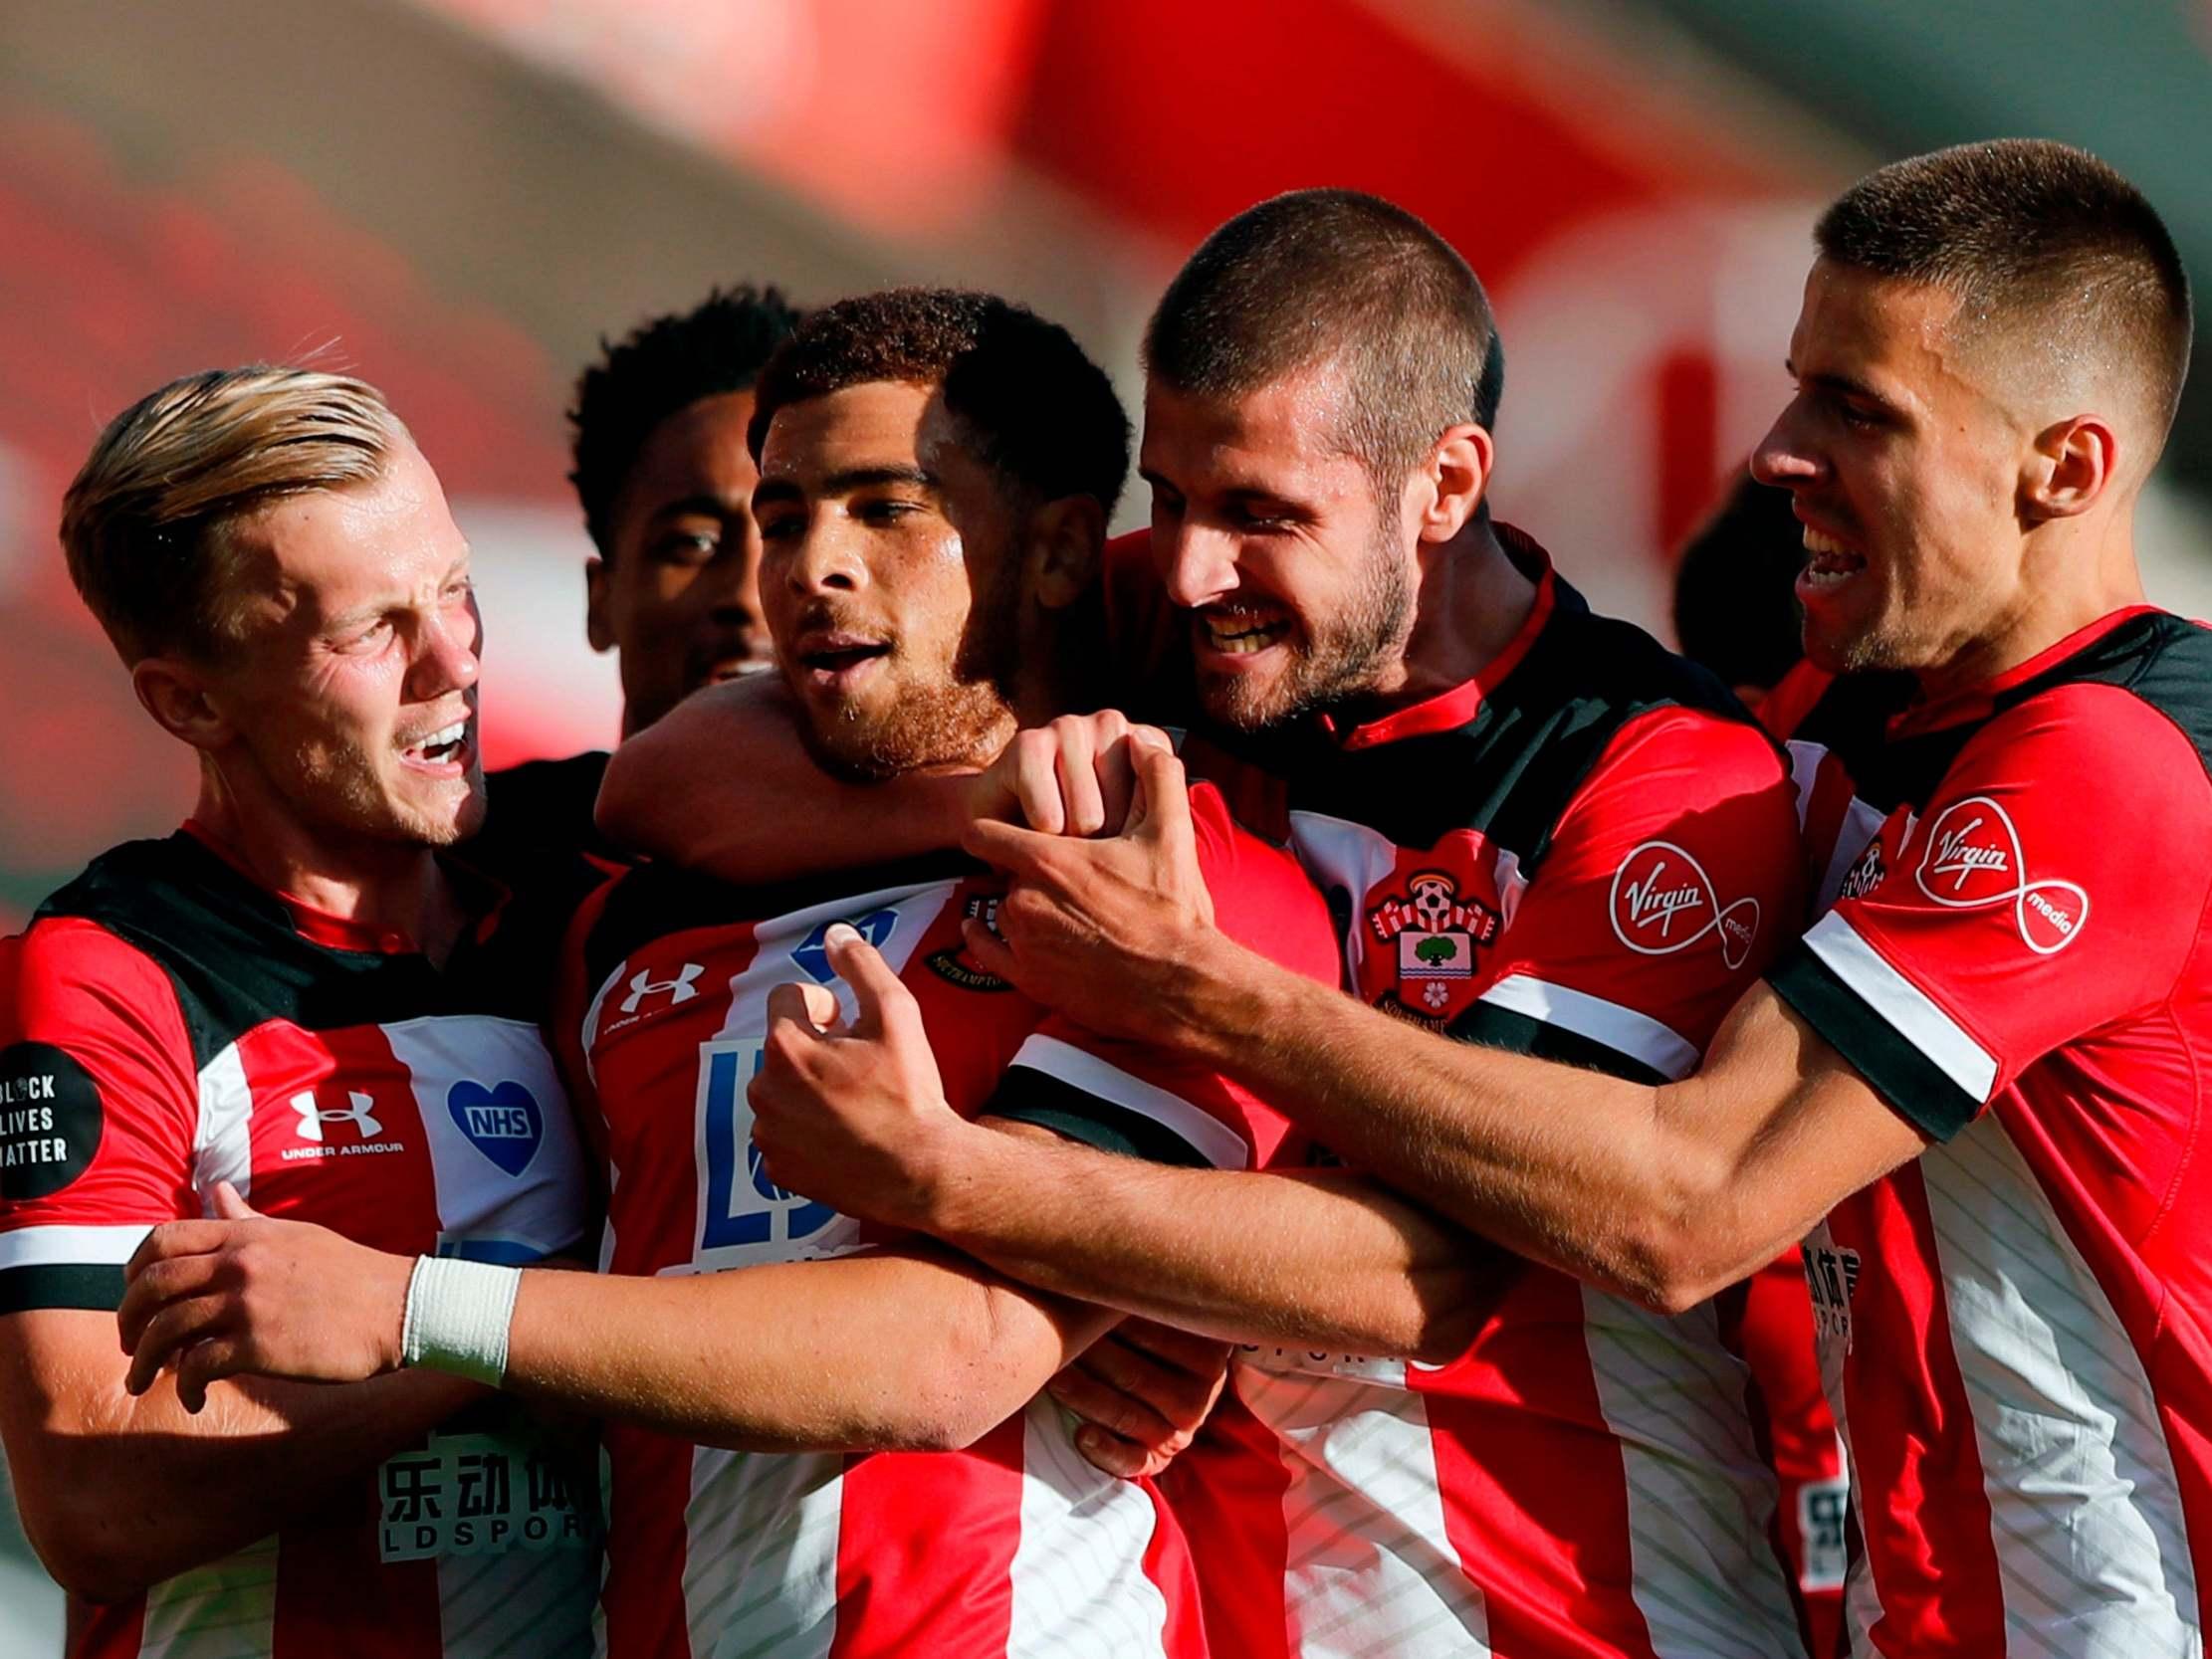 Southampton stun Man City as Che Adams breaks duck with spectacular 40-yard winner thumbnail